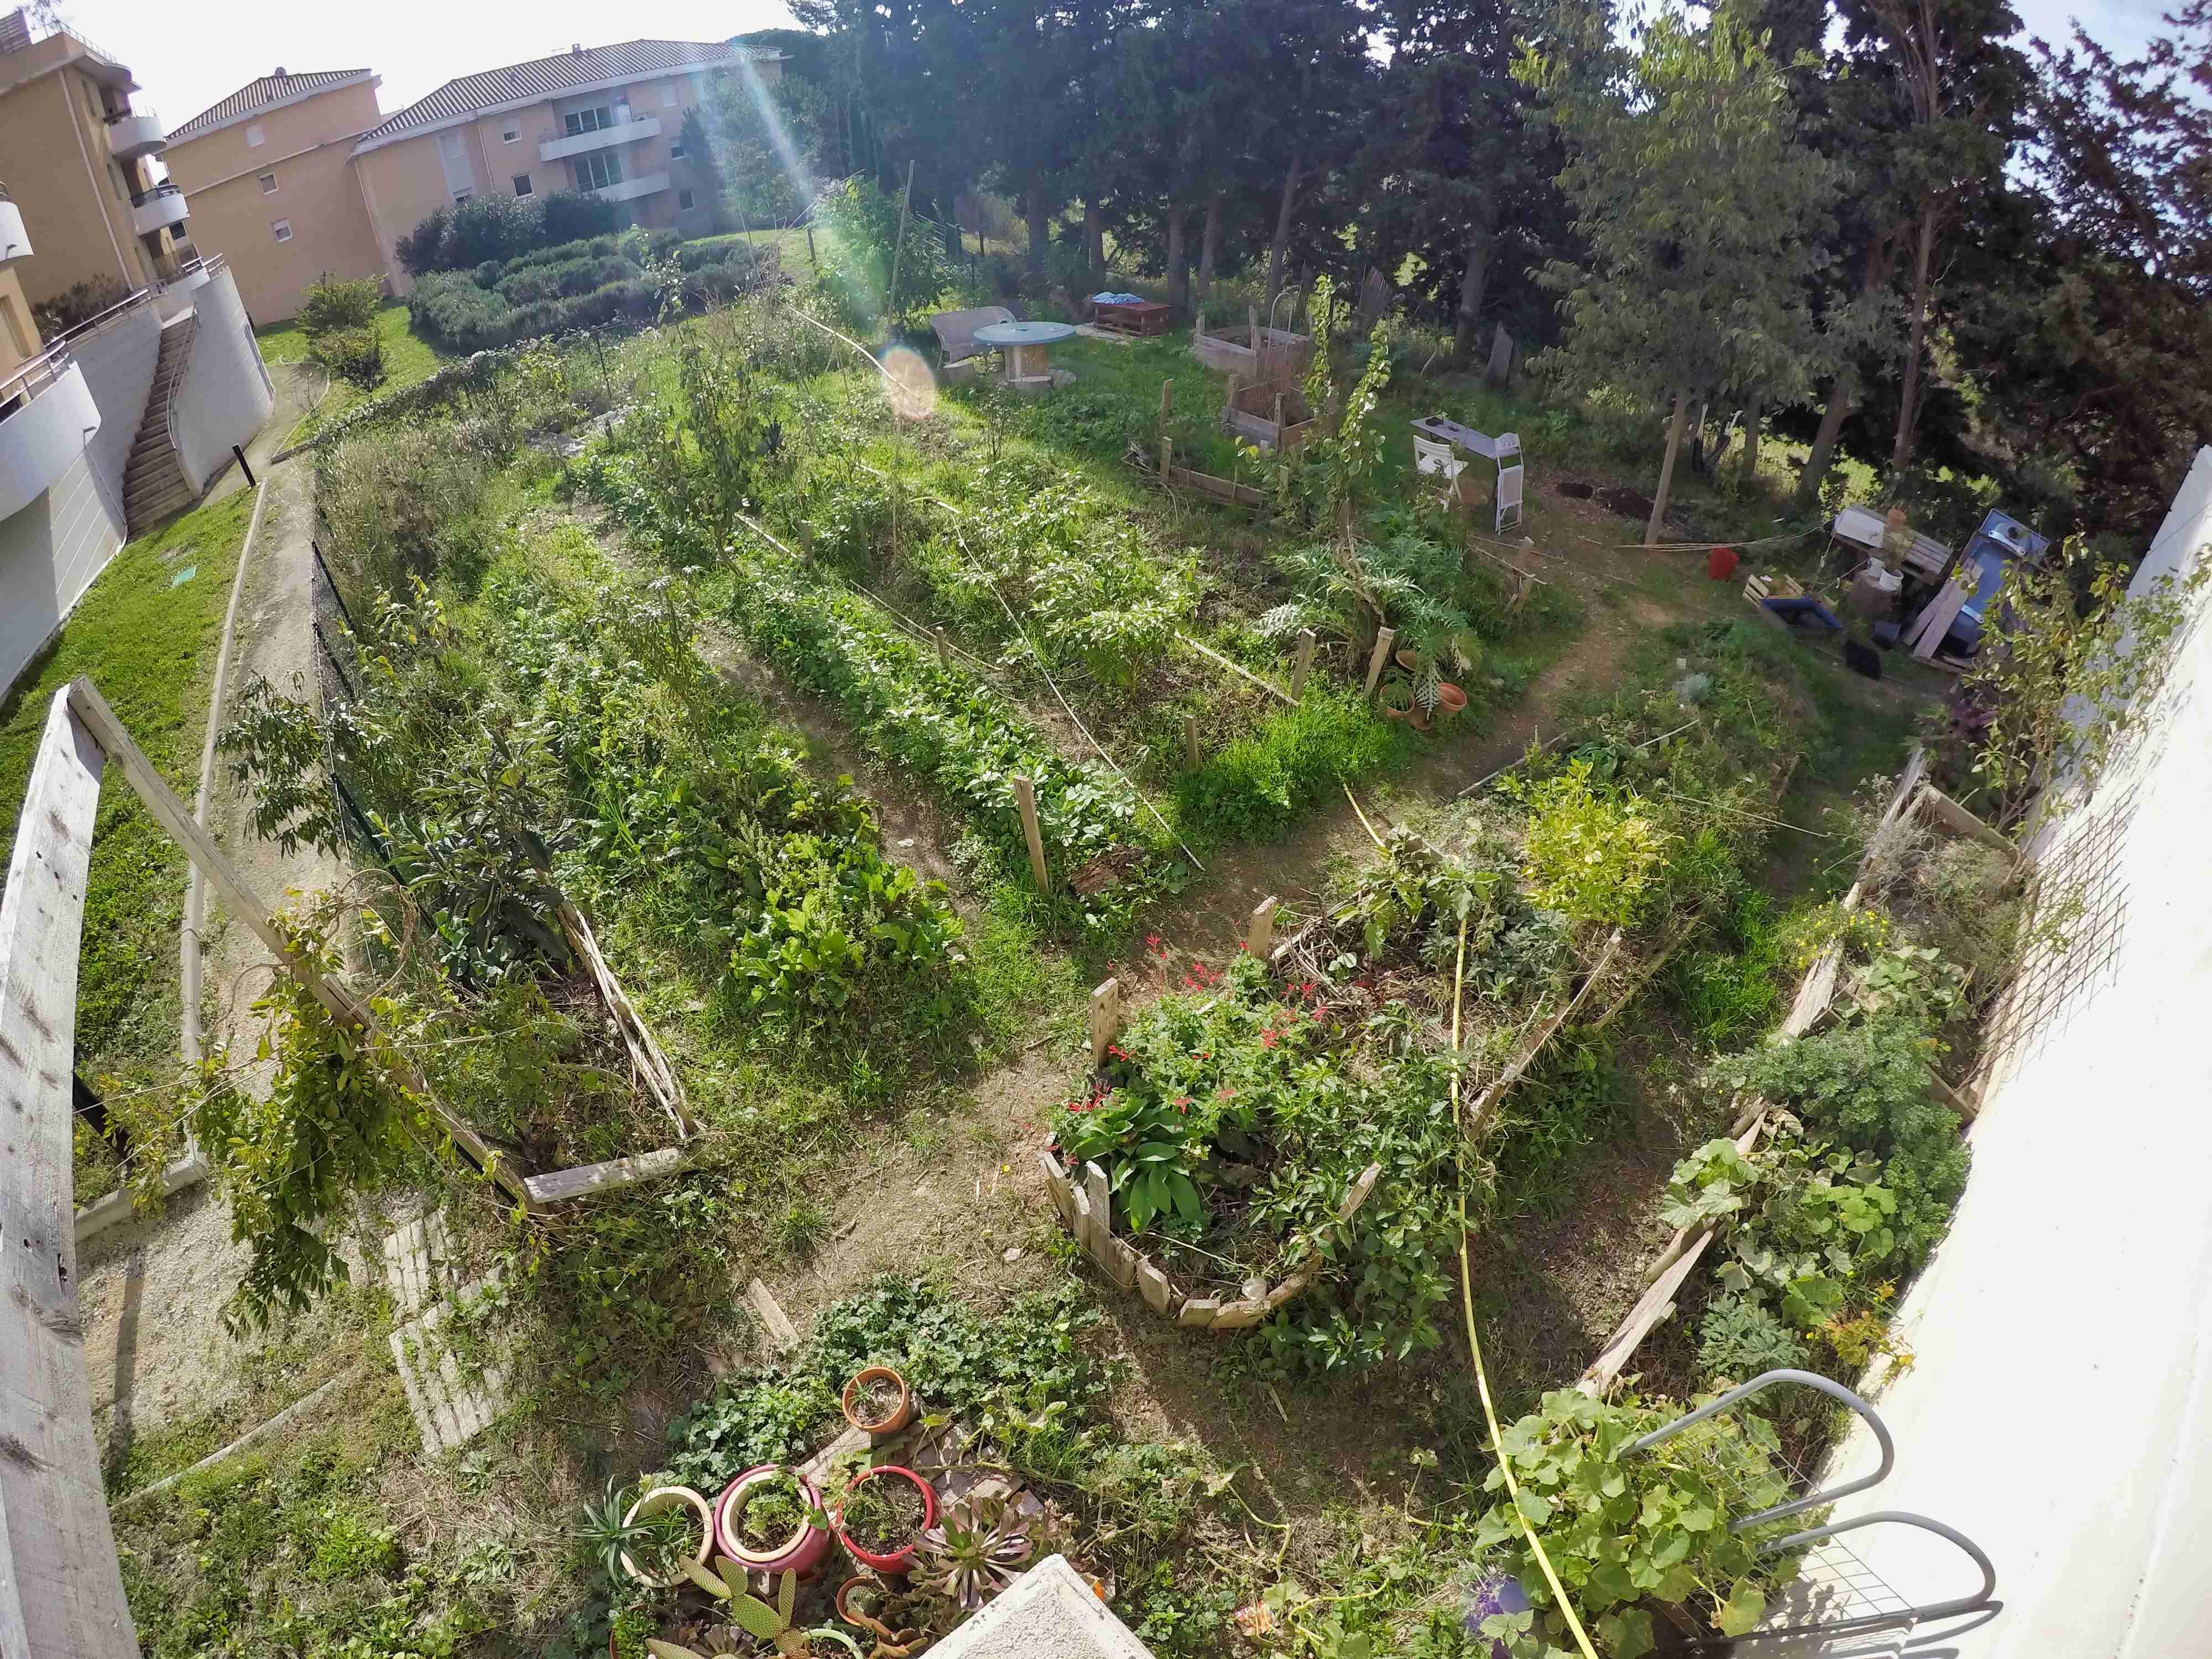 Photo du jardin de Villamont.